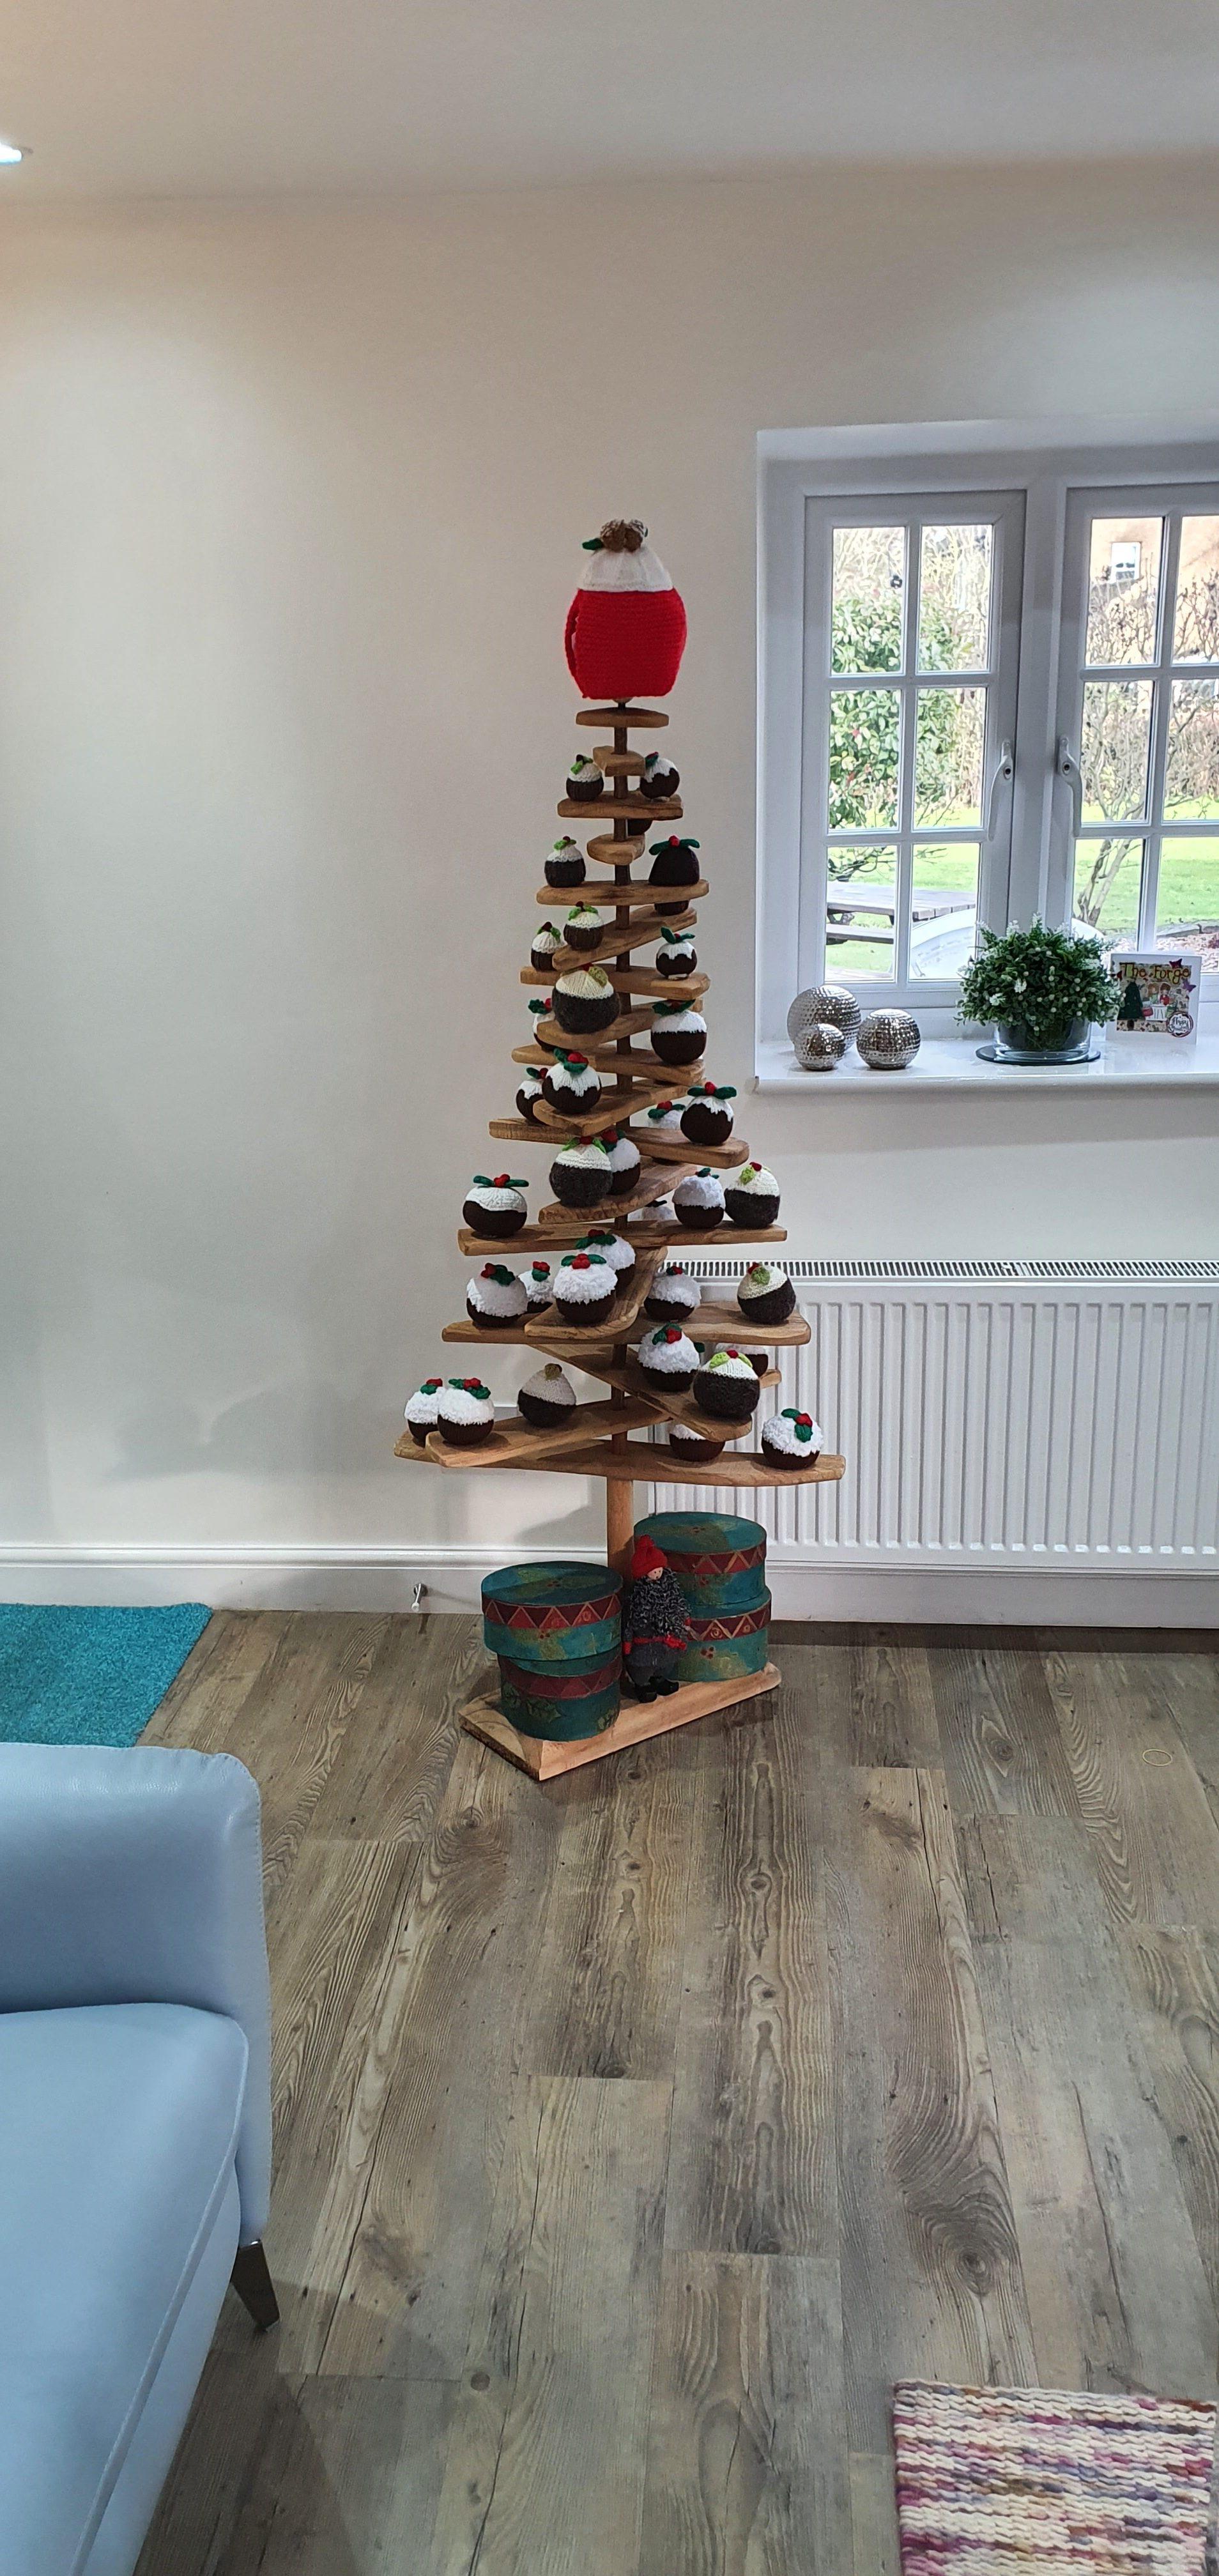 merry christmas pudding tree